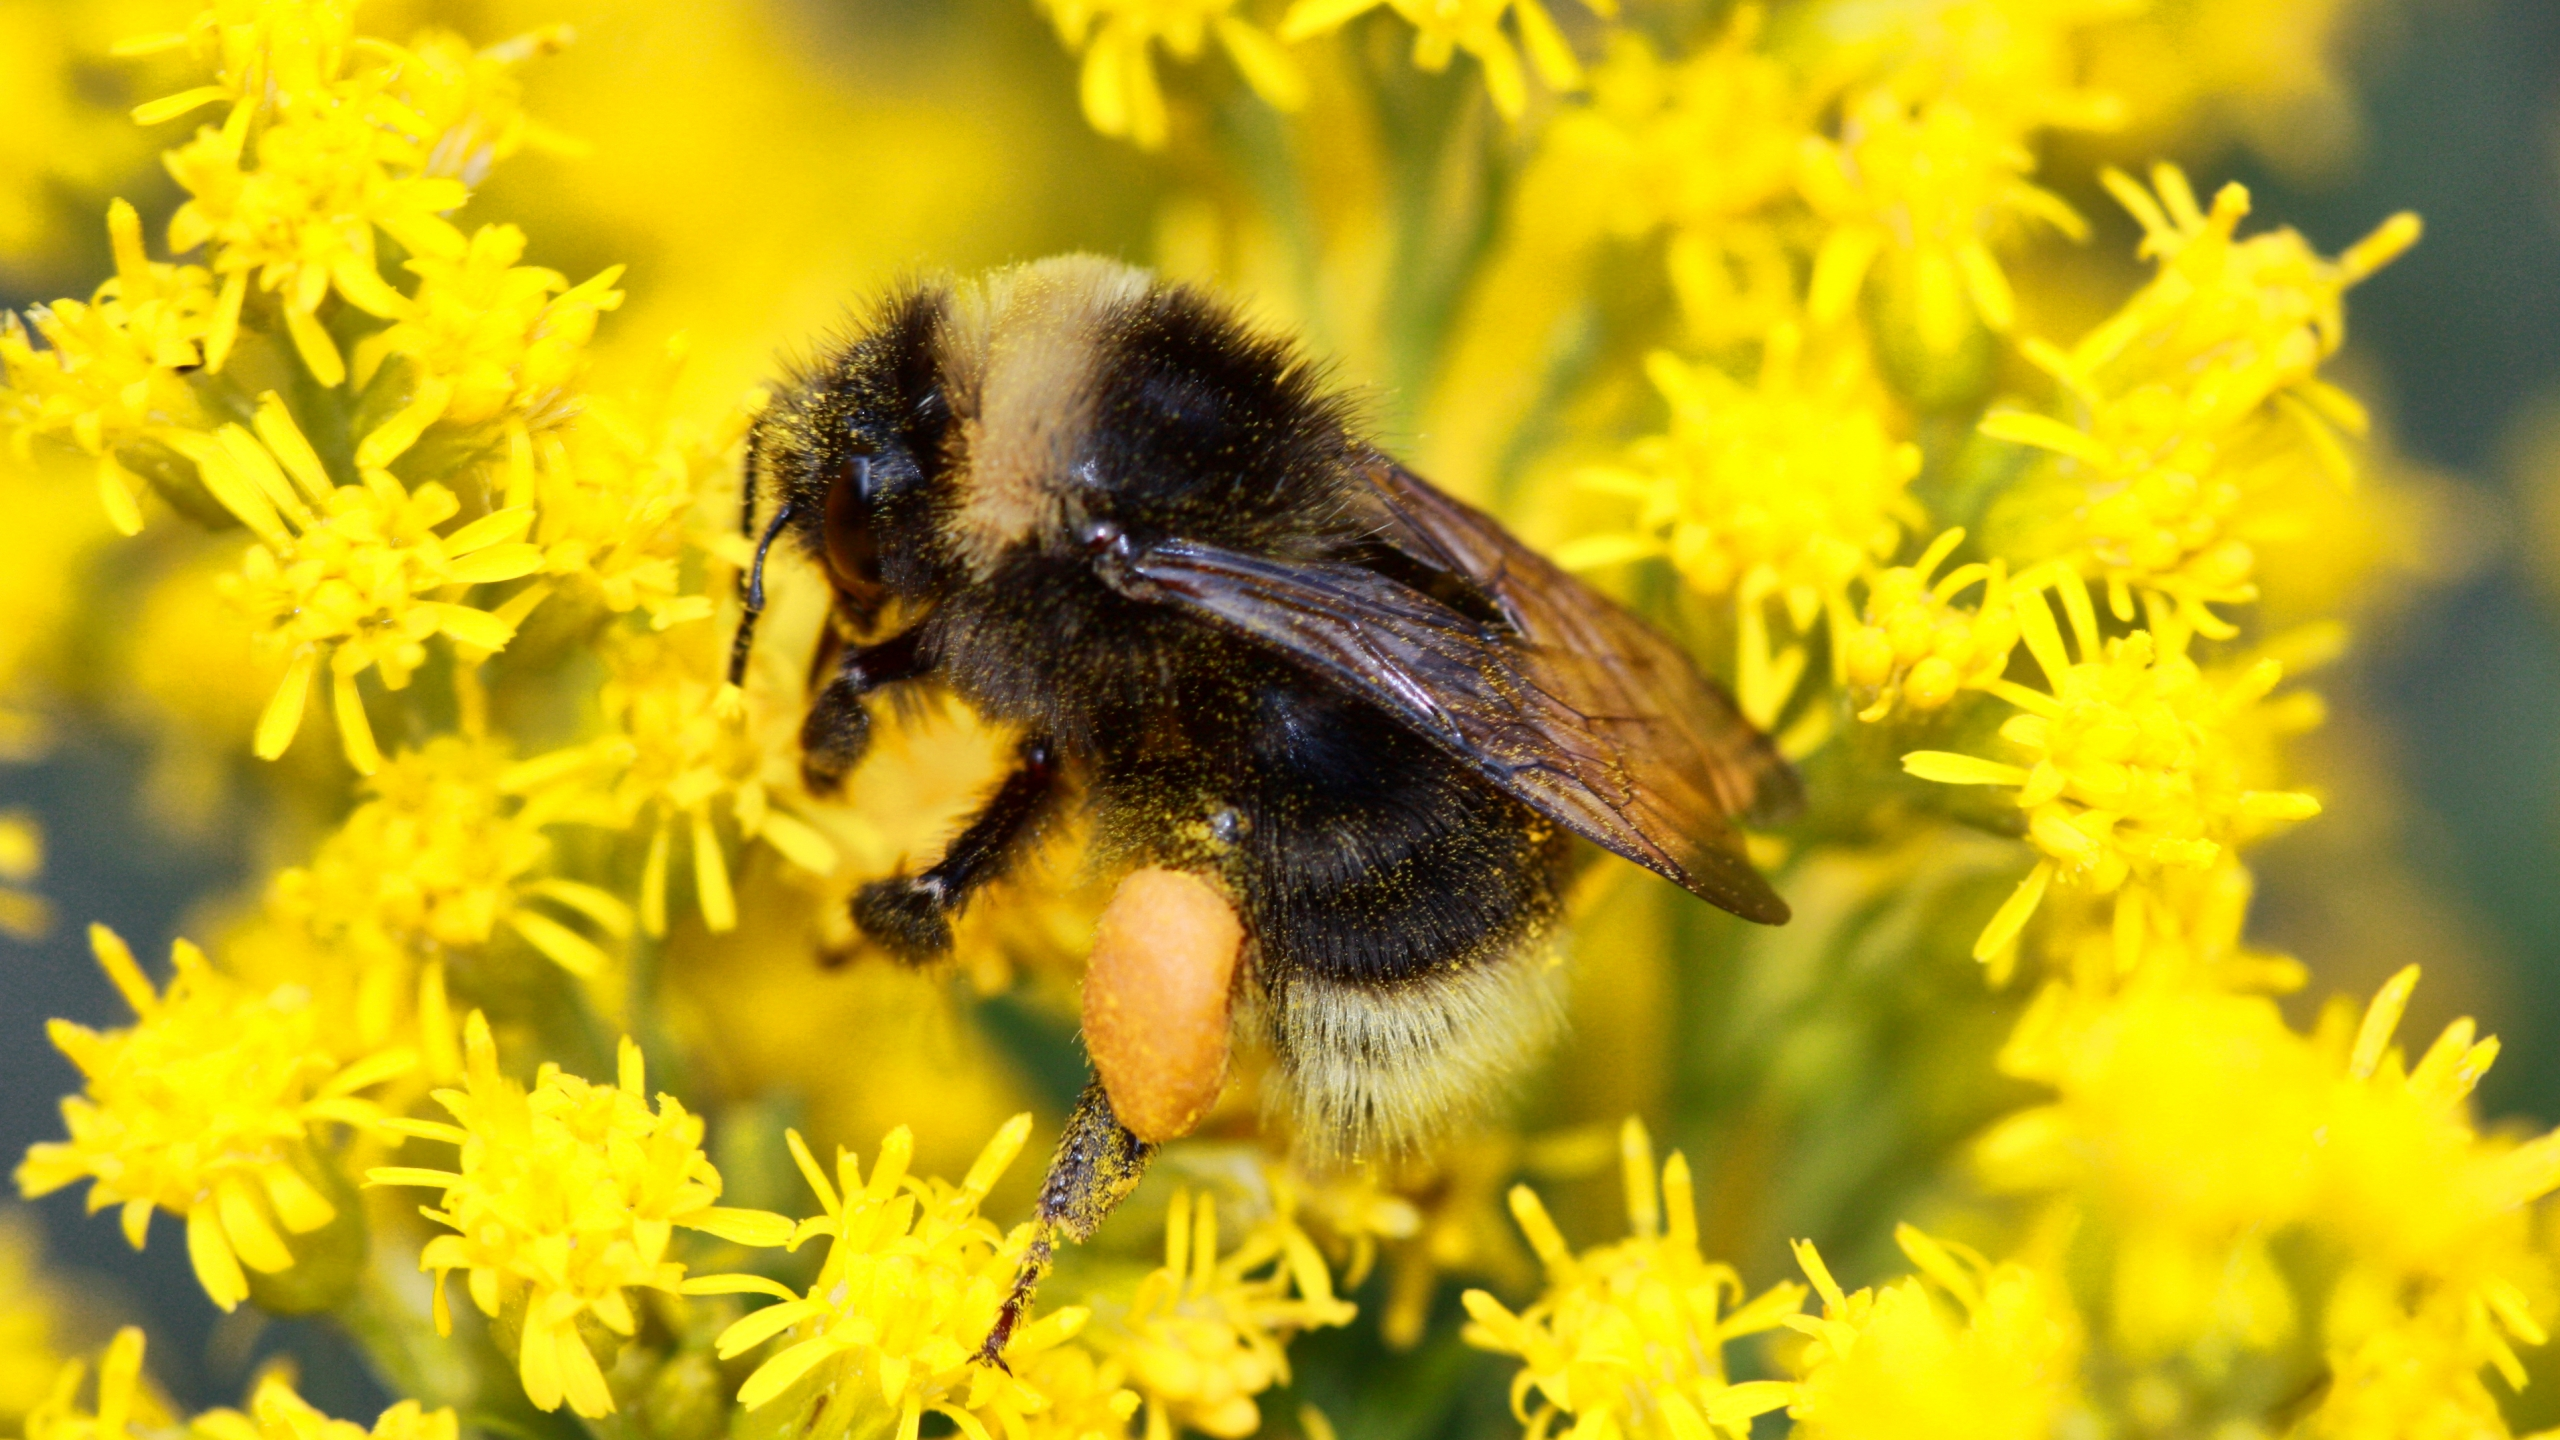 Bumblebee_Survey_69840-159532.jpg11182009